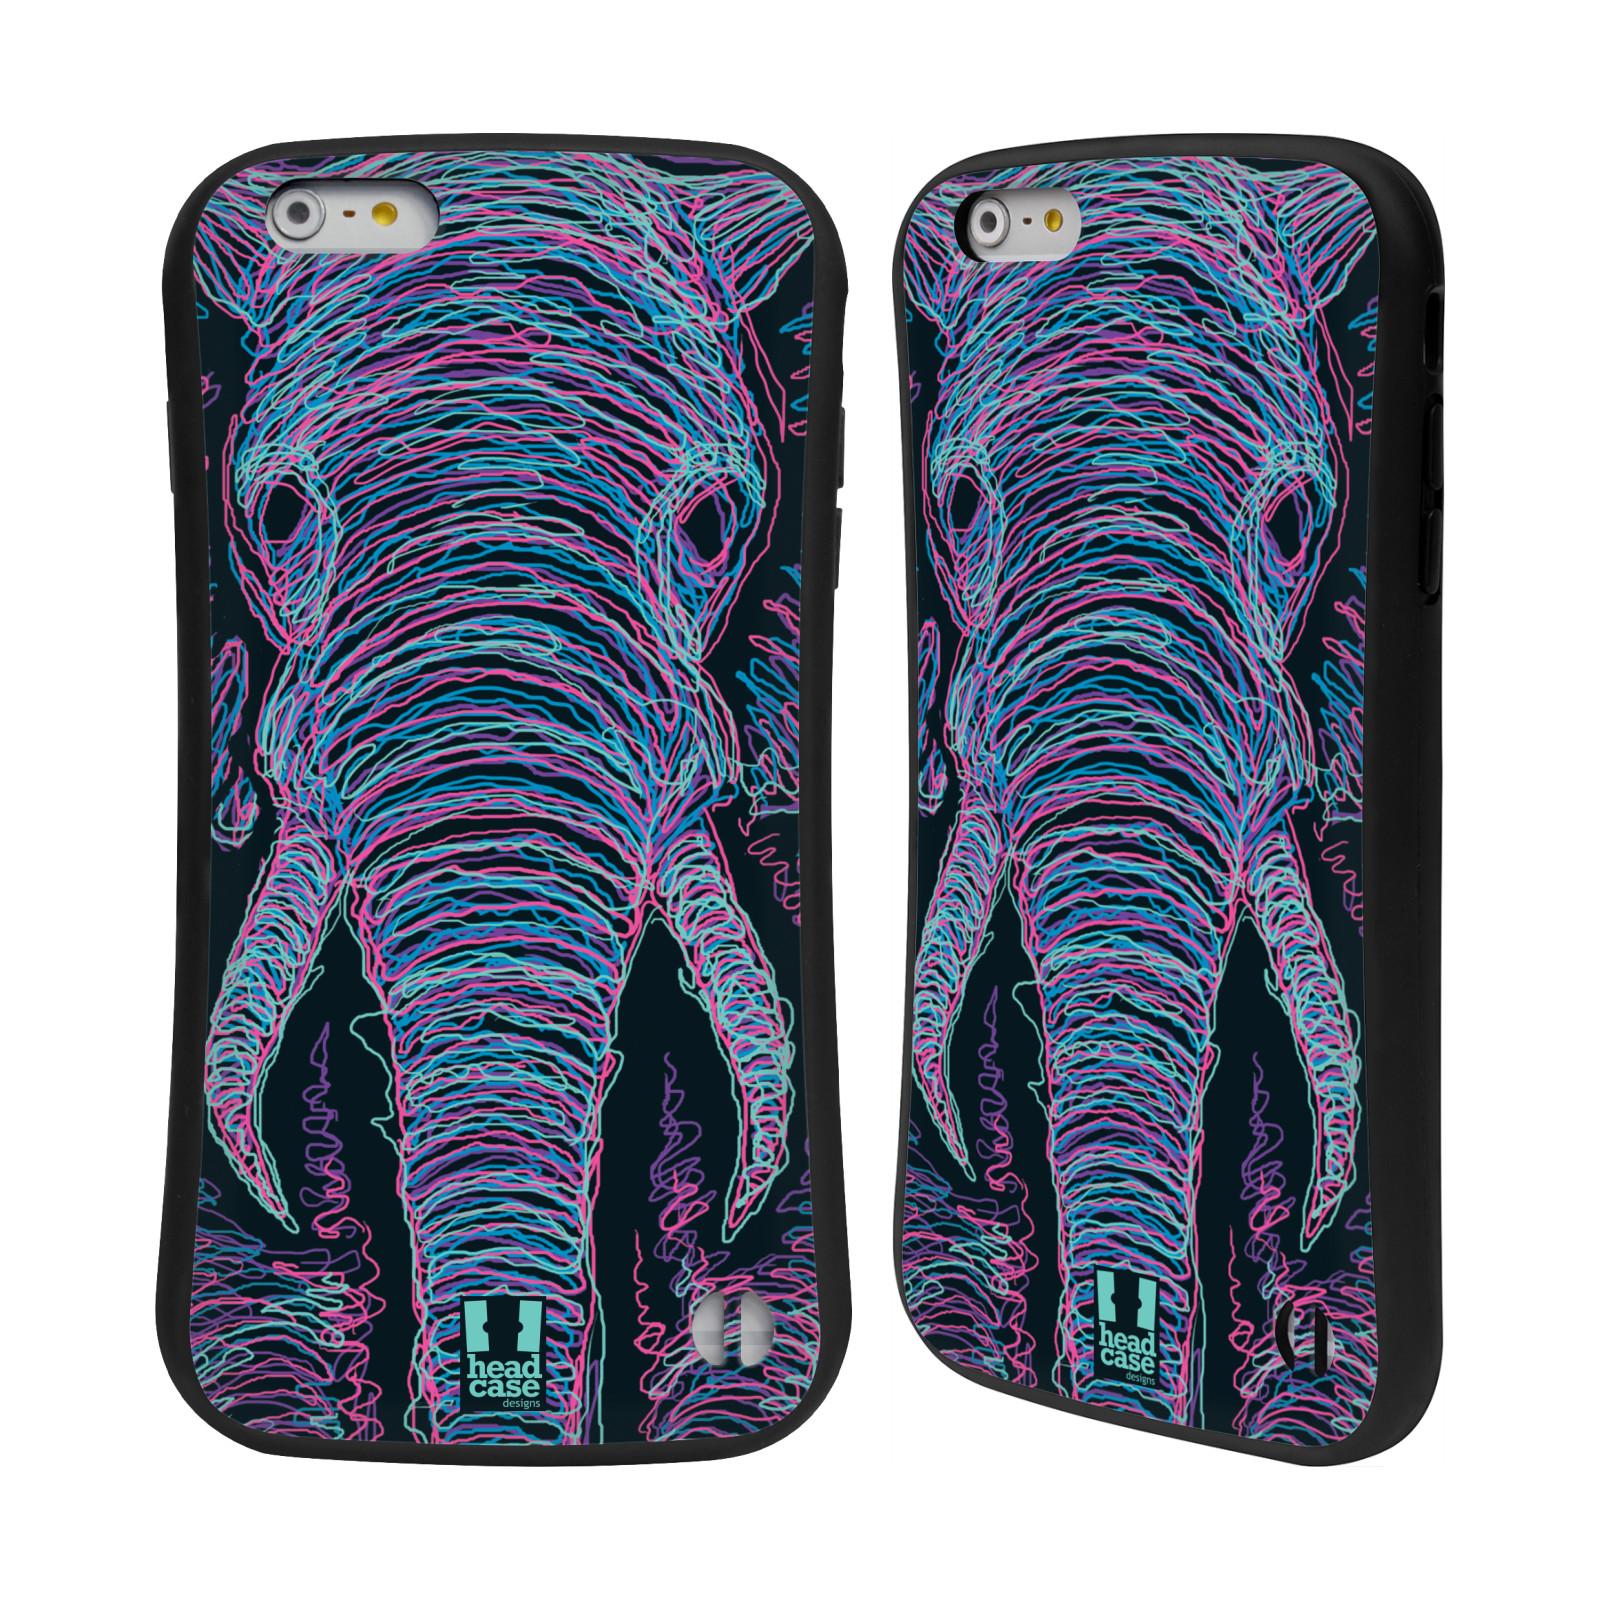 HEAD CASE silikon/plast odolný obal na mobil Apple Iphone 6 PLUS / 6S PLUS vzor zvíře čmáranice slon